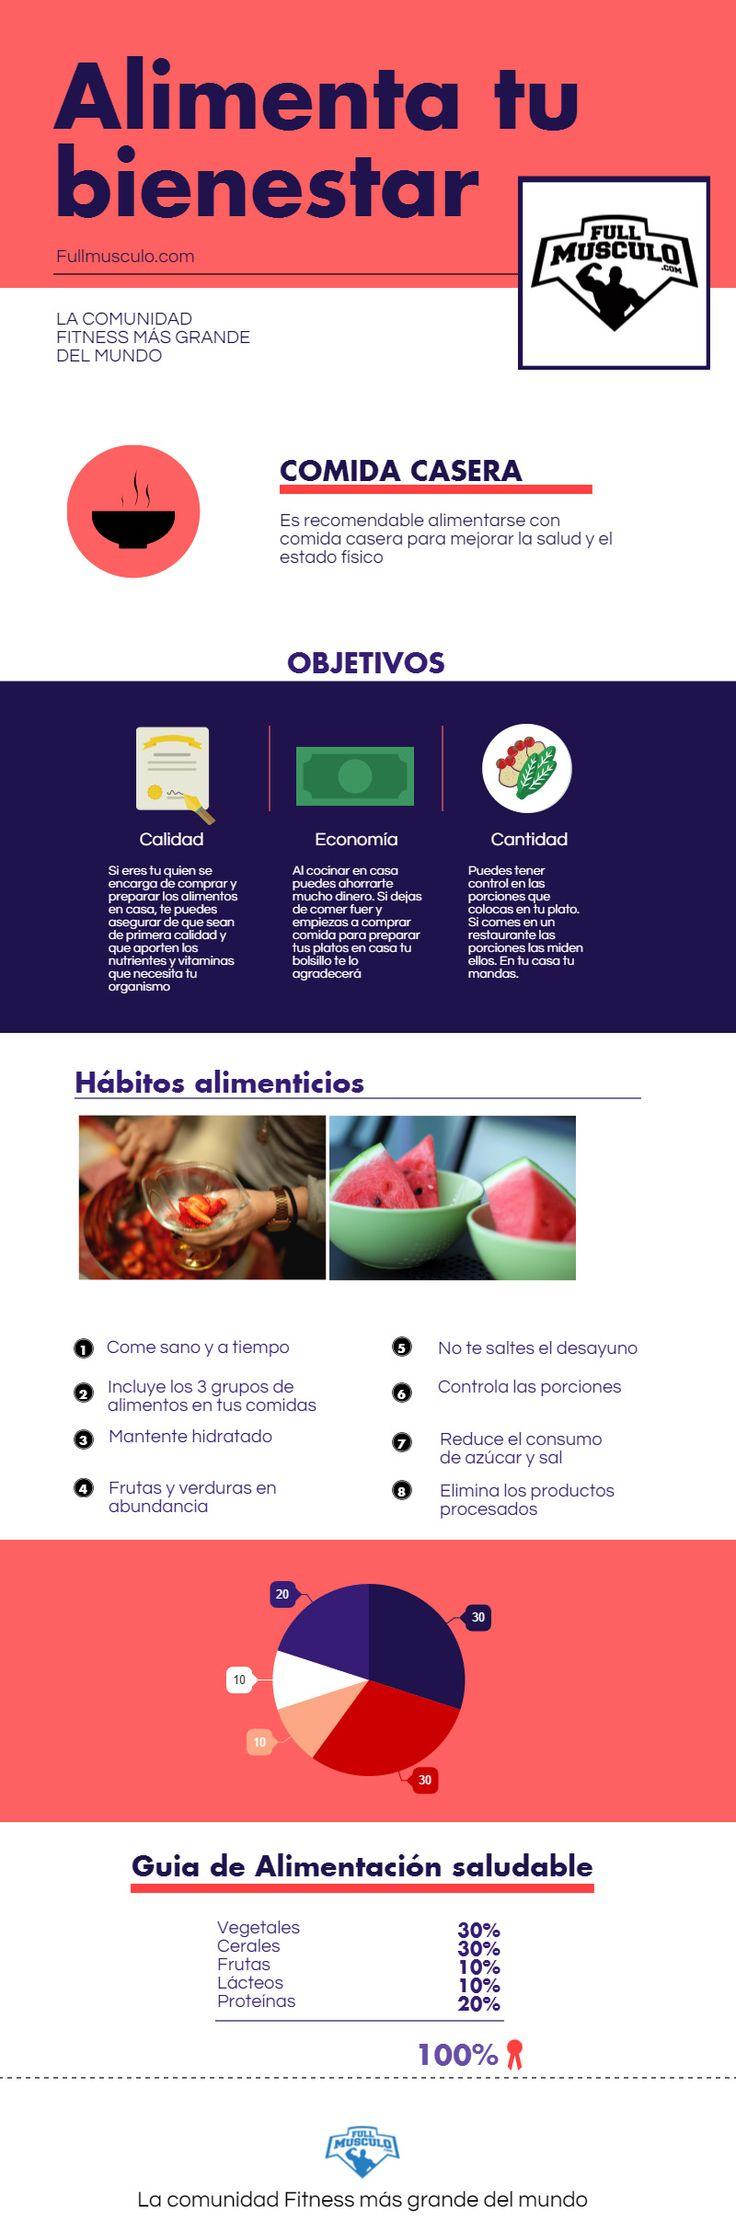 habitos alimenticios infografia